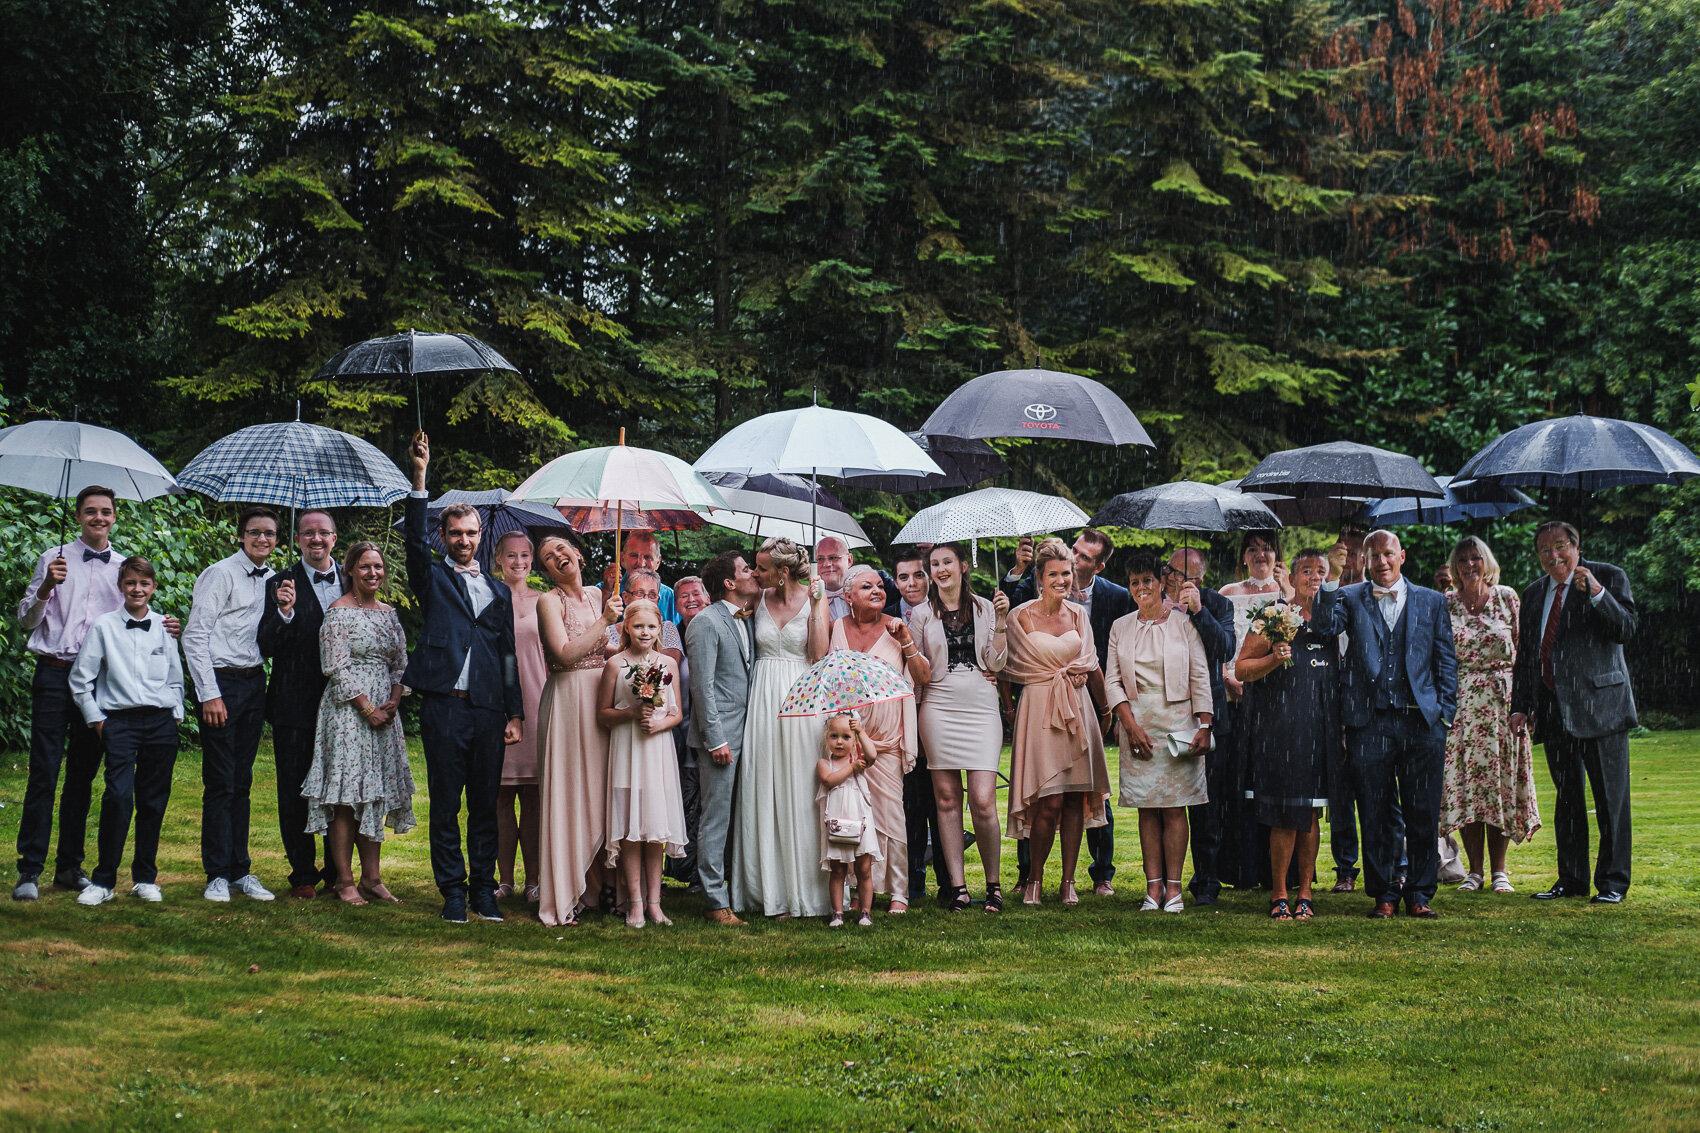 iso800 - huwelijksfotograaf isabo matthias verbeke foundation-20.jpg